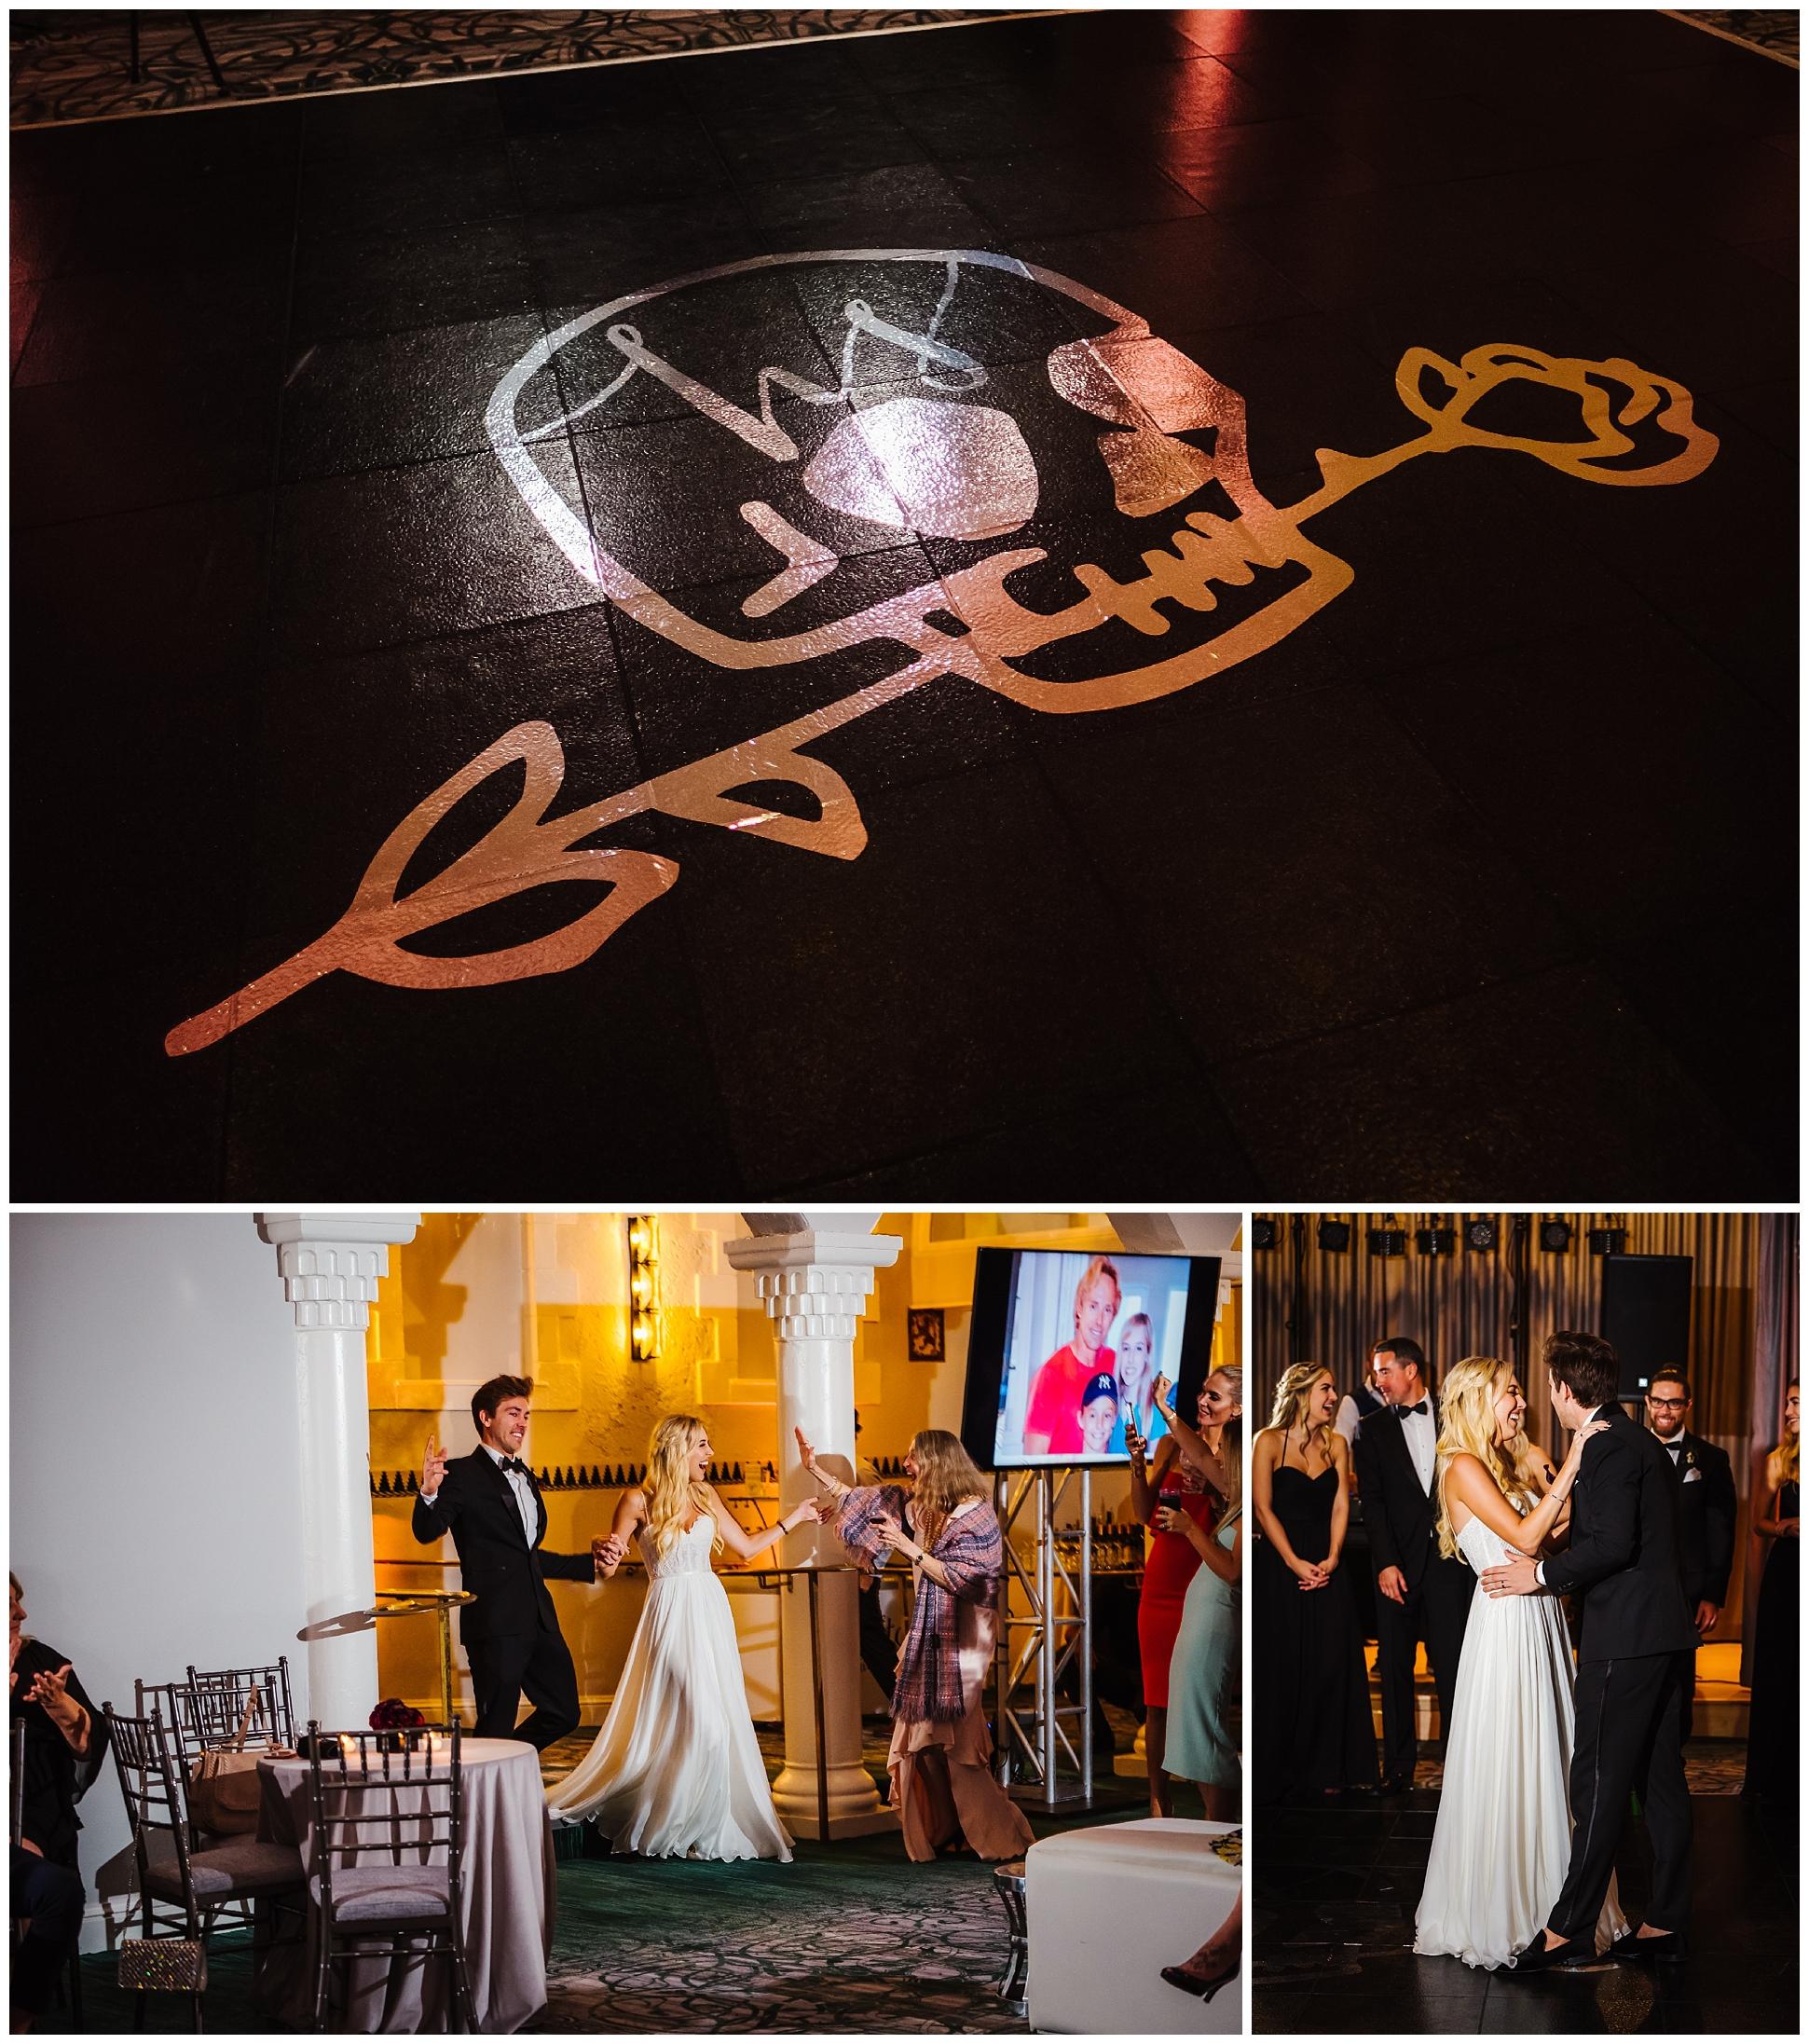 st-pete-wedding-photographer-backyard-luxury-snell-isle-vinoy_0055.jpg